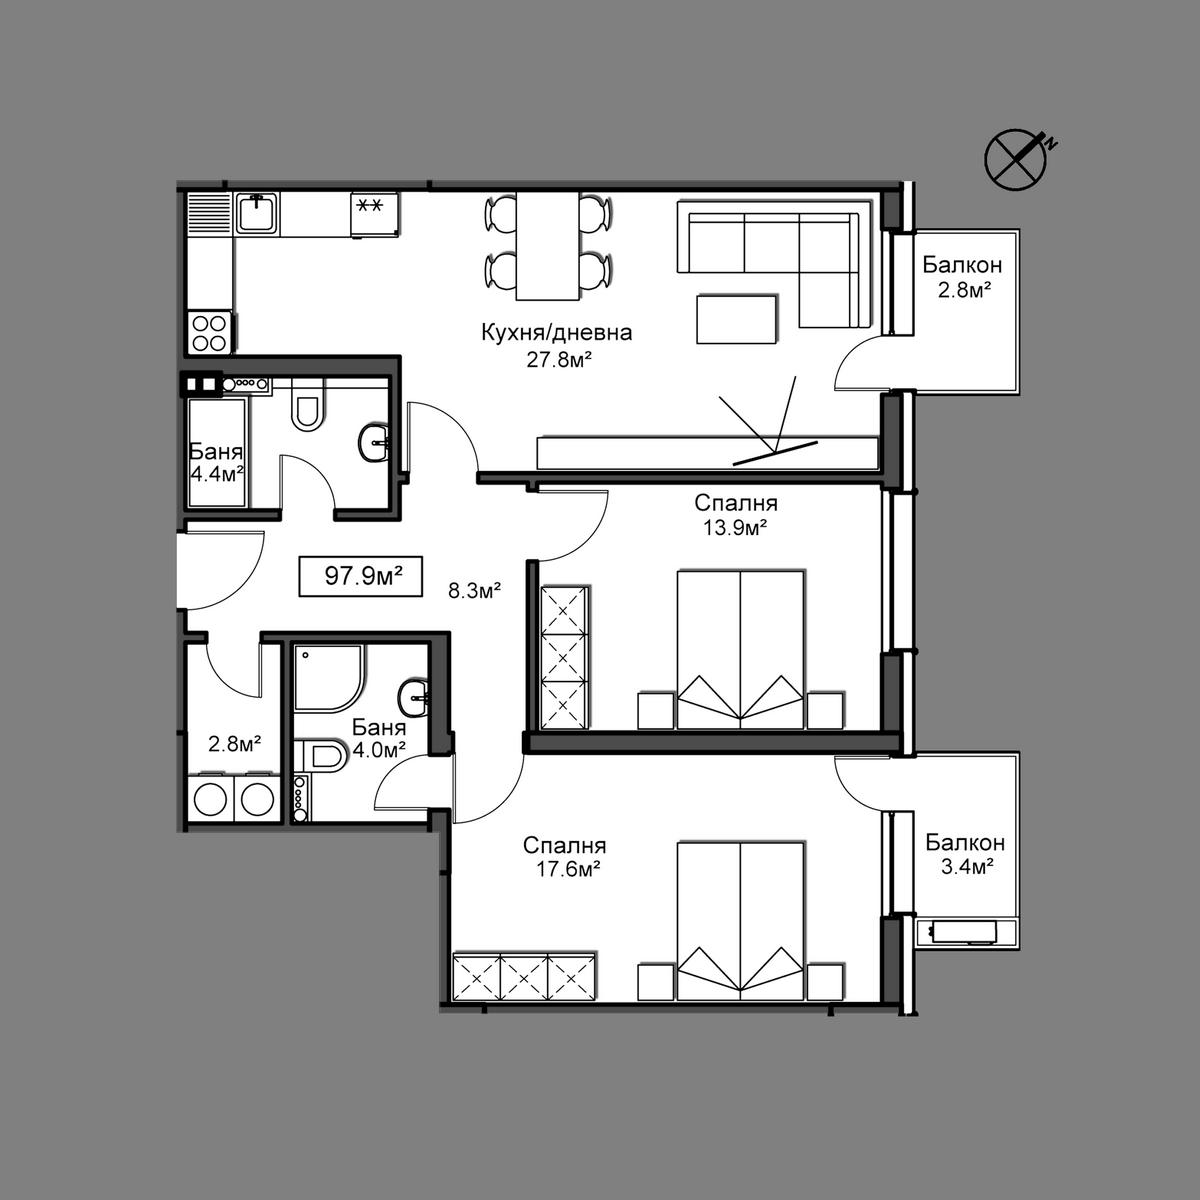 Продава апартамент ново строителство - Апартамент 13